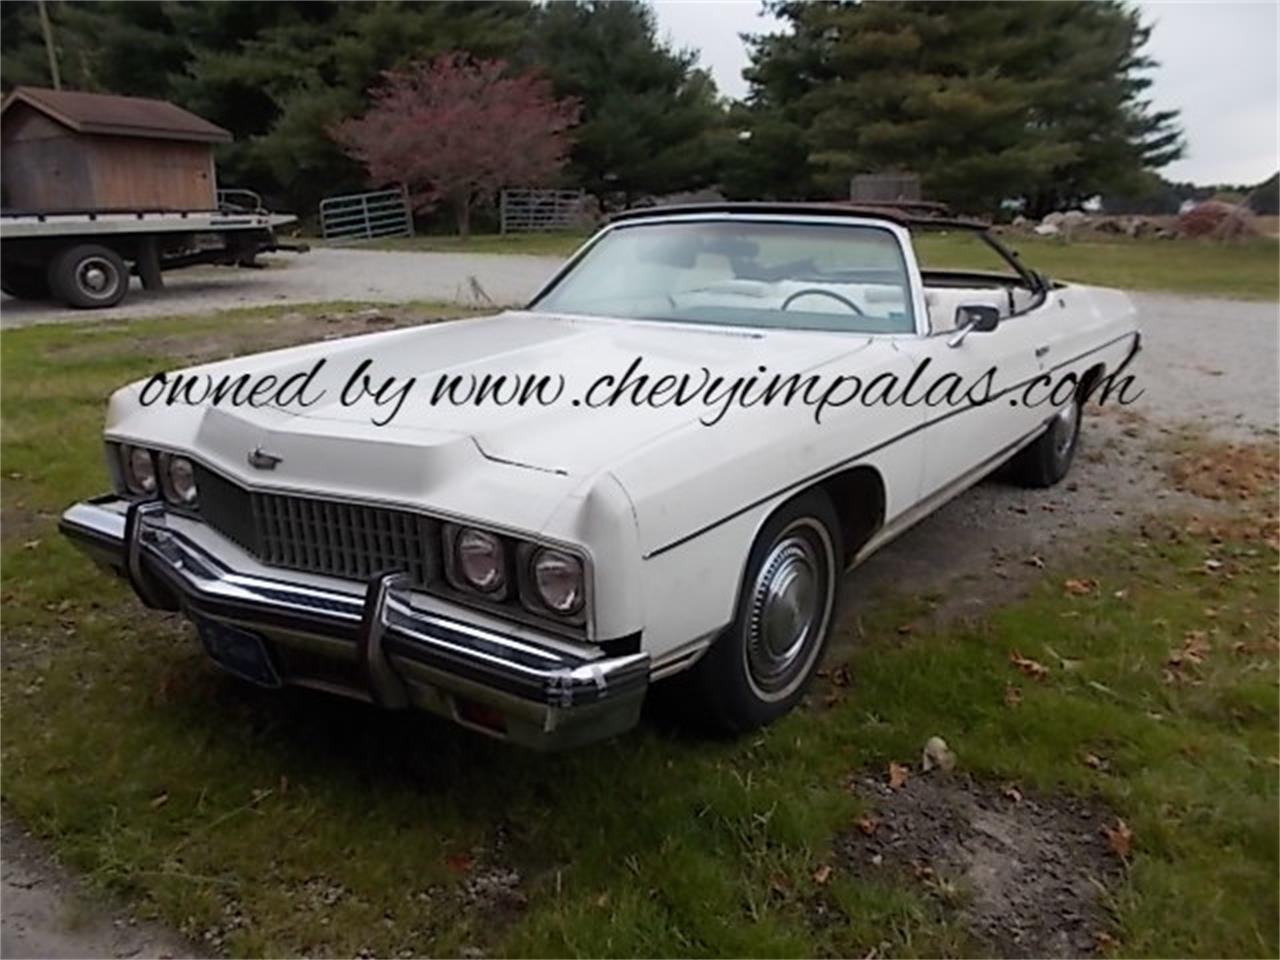 1973 Chevrolet Caprice For Sale Classiccars Com Cc 1157396